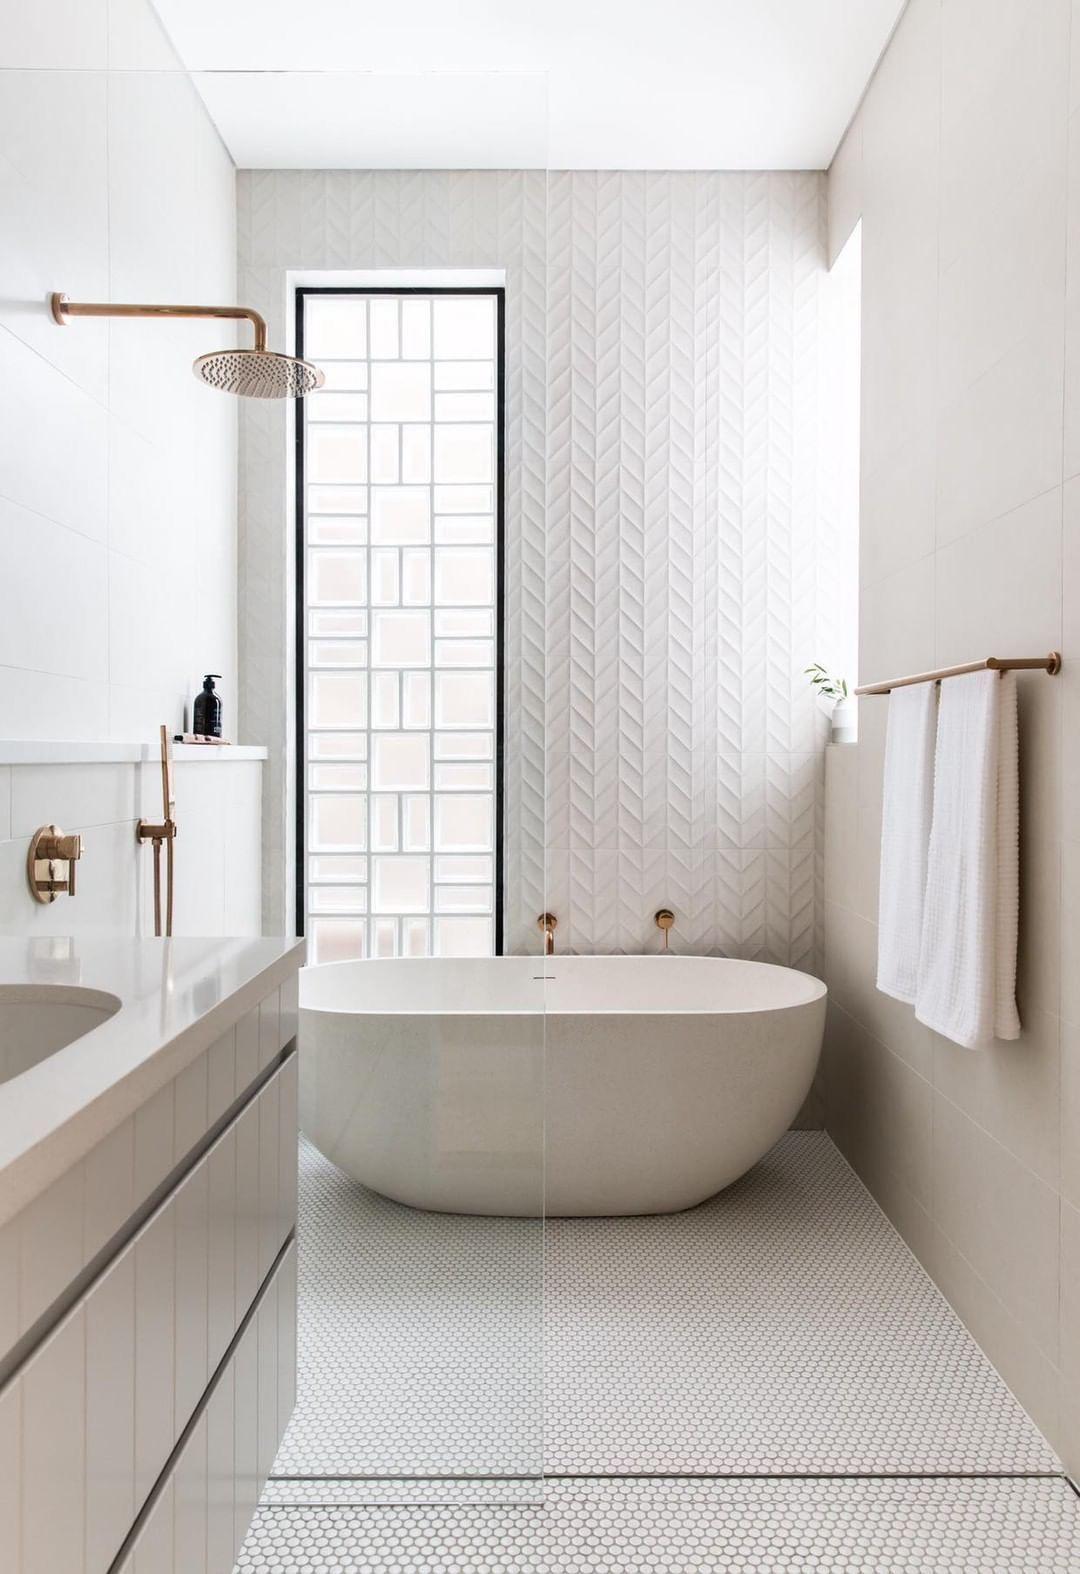 Bathroom Aesthetic Bathroomdecoration Bathroom Bathroom Ideas Bathroom Tiles Bathroom In 2020 Badezimmereinrichtung Badezimmer Klein Badezimmer Innenausstattung